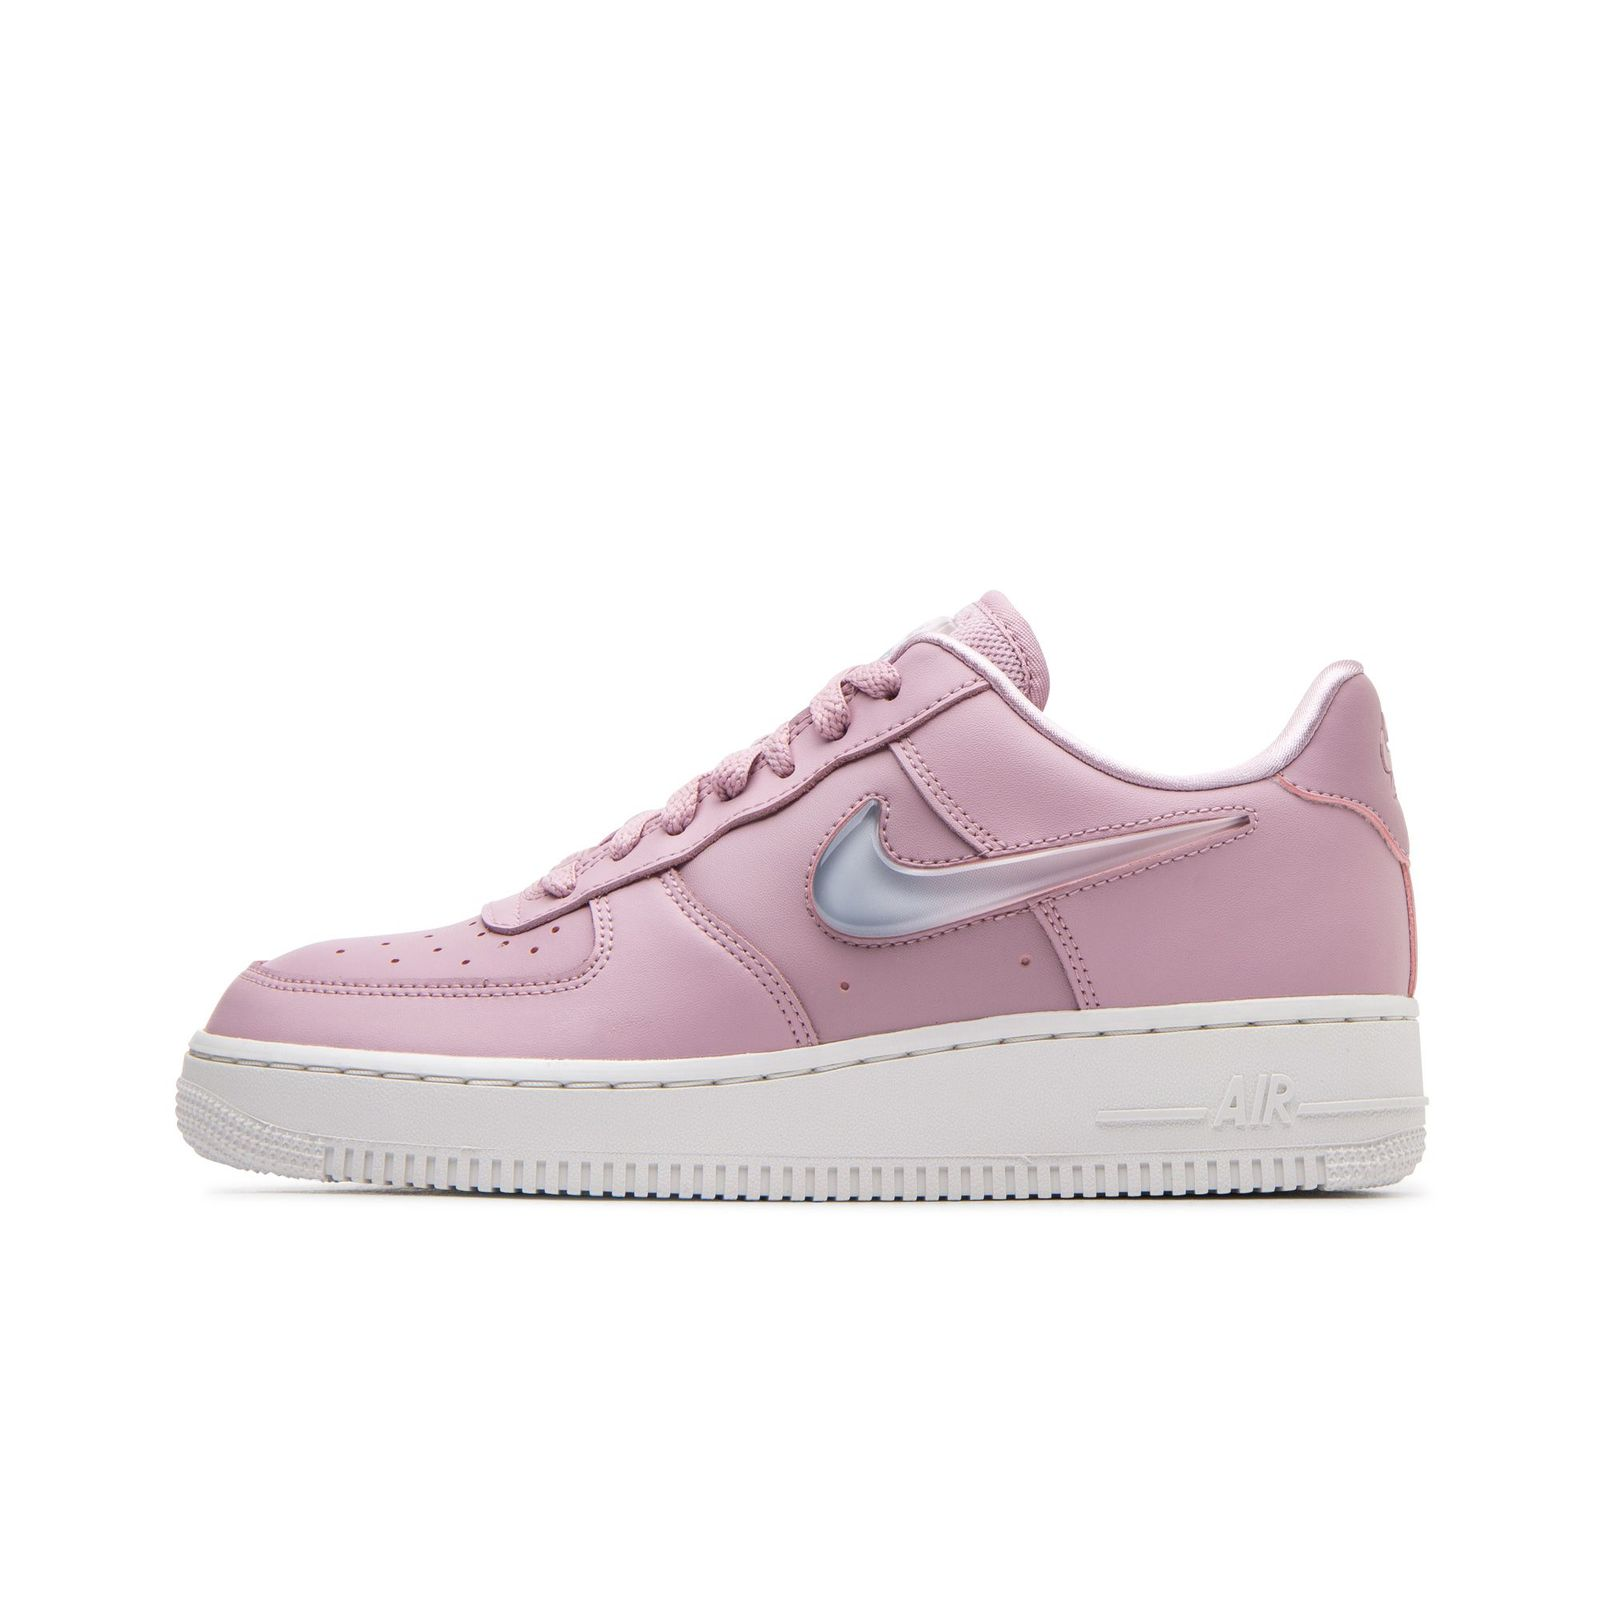 size 40 94314 7c3da Nike Air Force 1 '07 Premium (Plum Chalk/ and 50 similar items